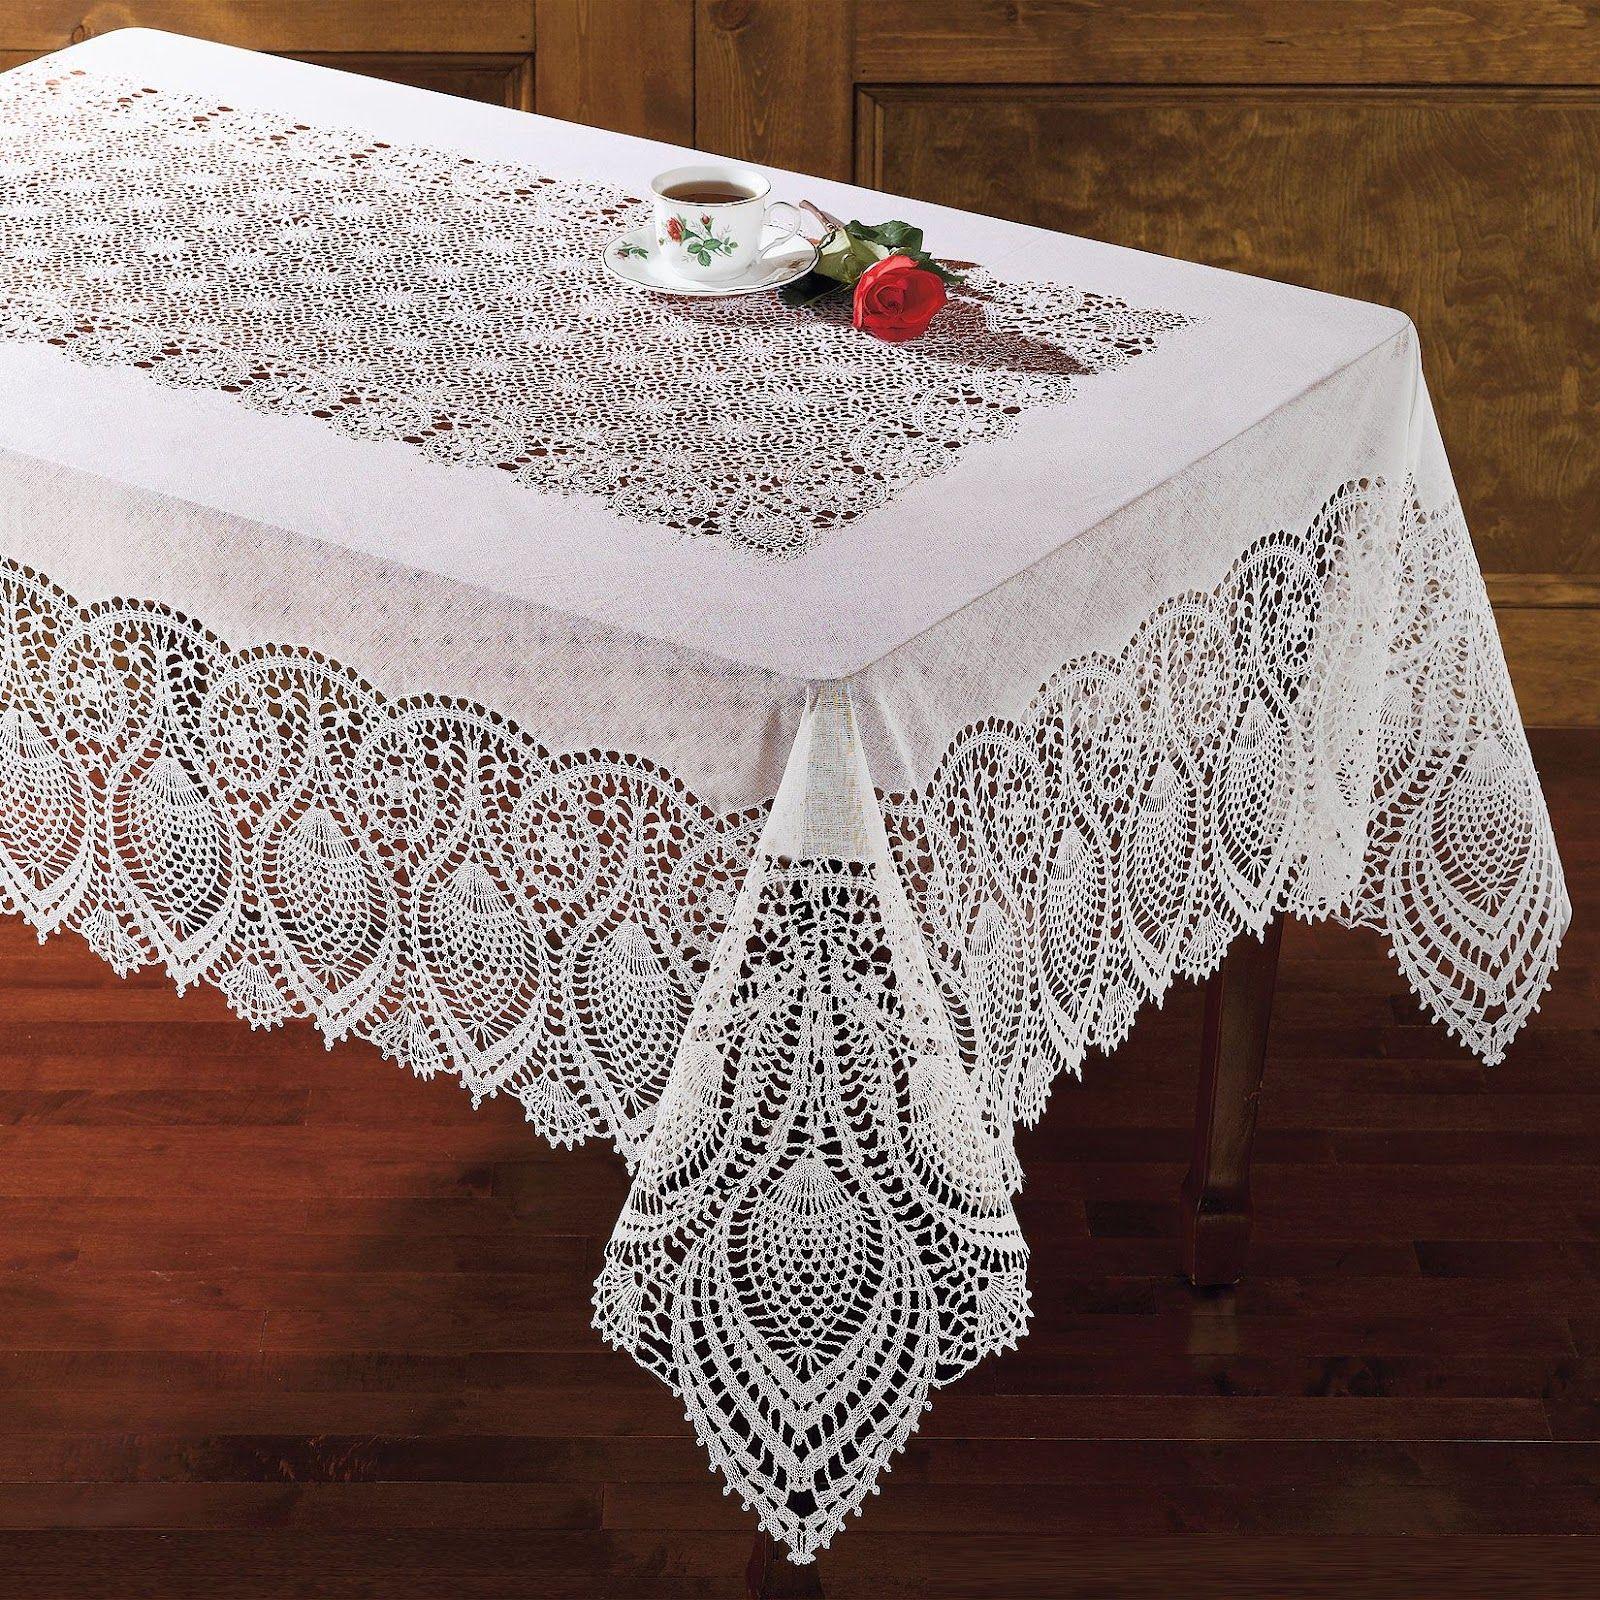 lace tablecloth Google Search Tea Anyone Pinterest